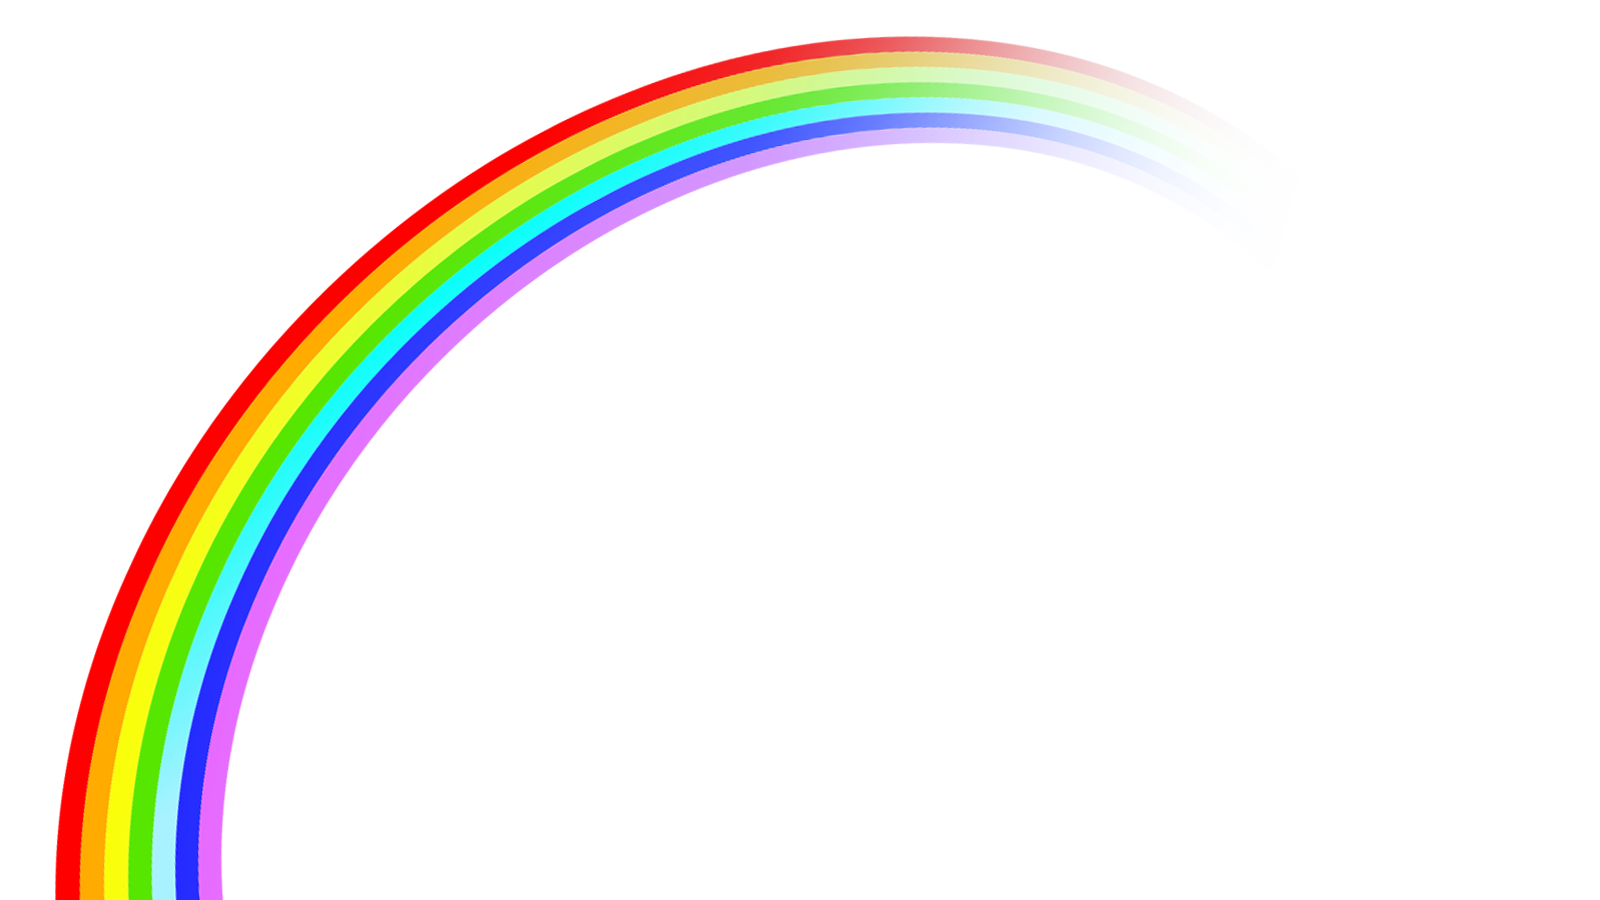 1600x900 Image Of Rainbow (24)